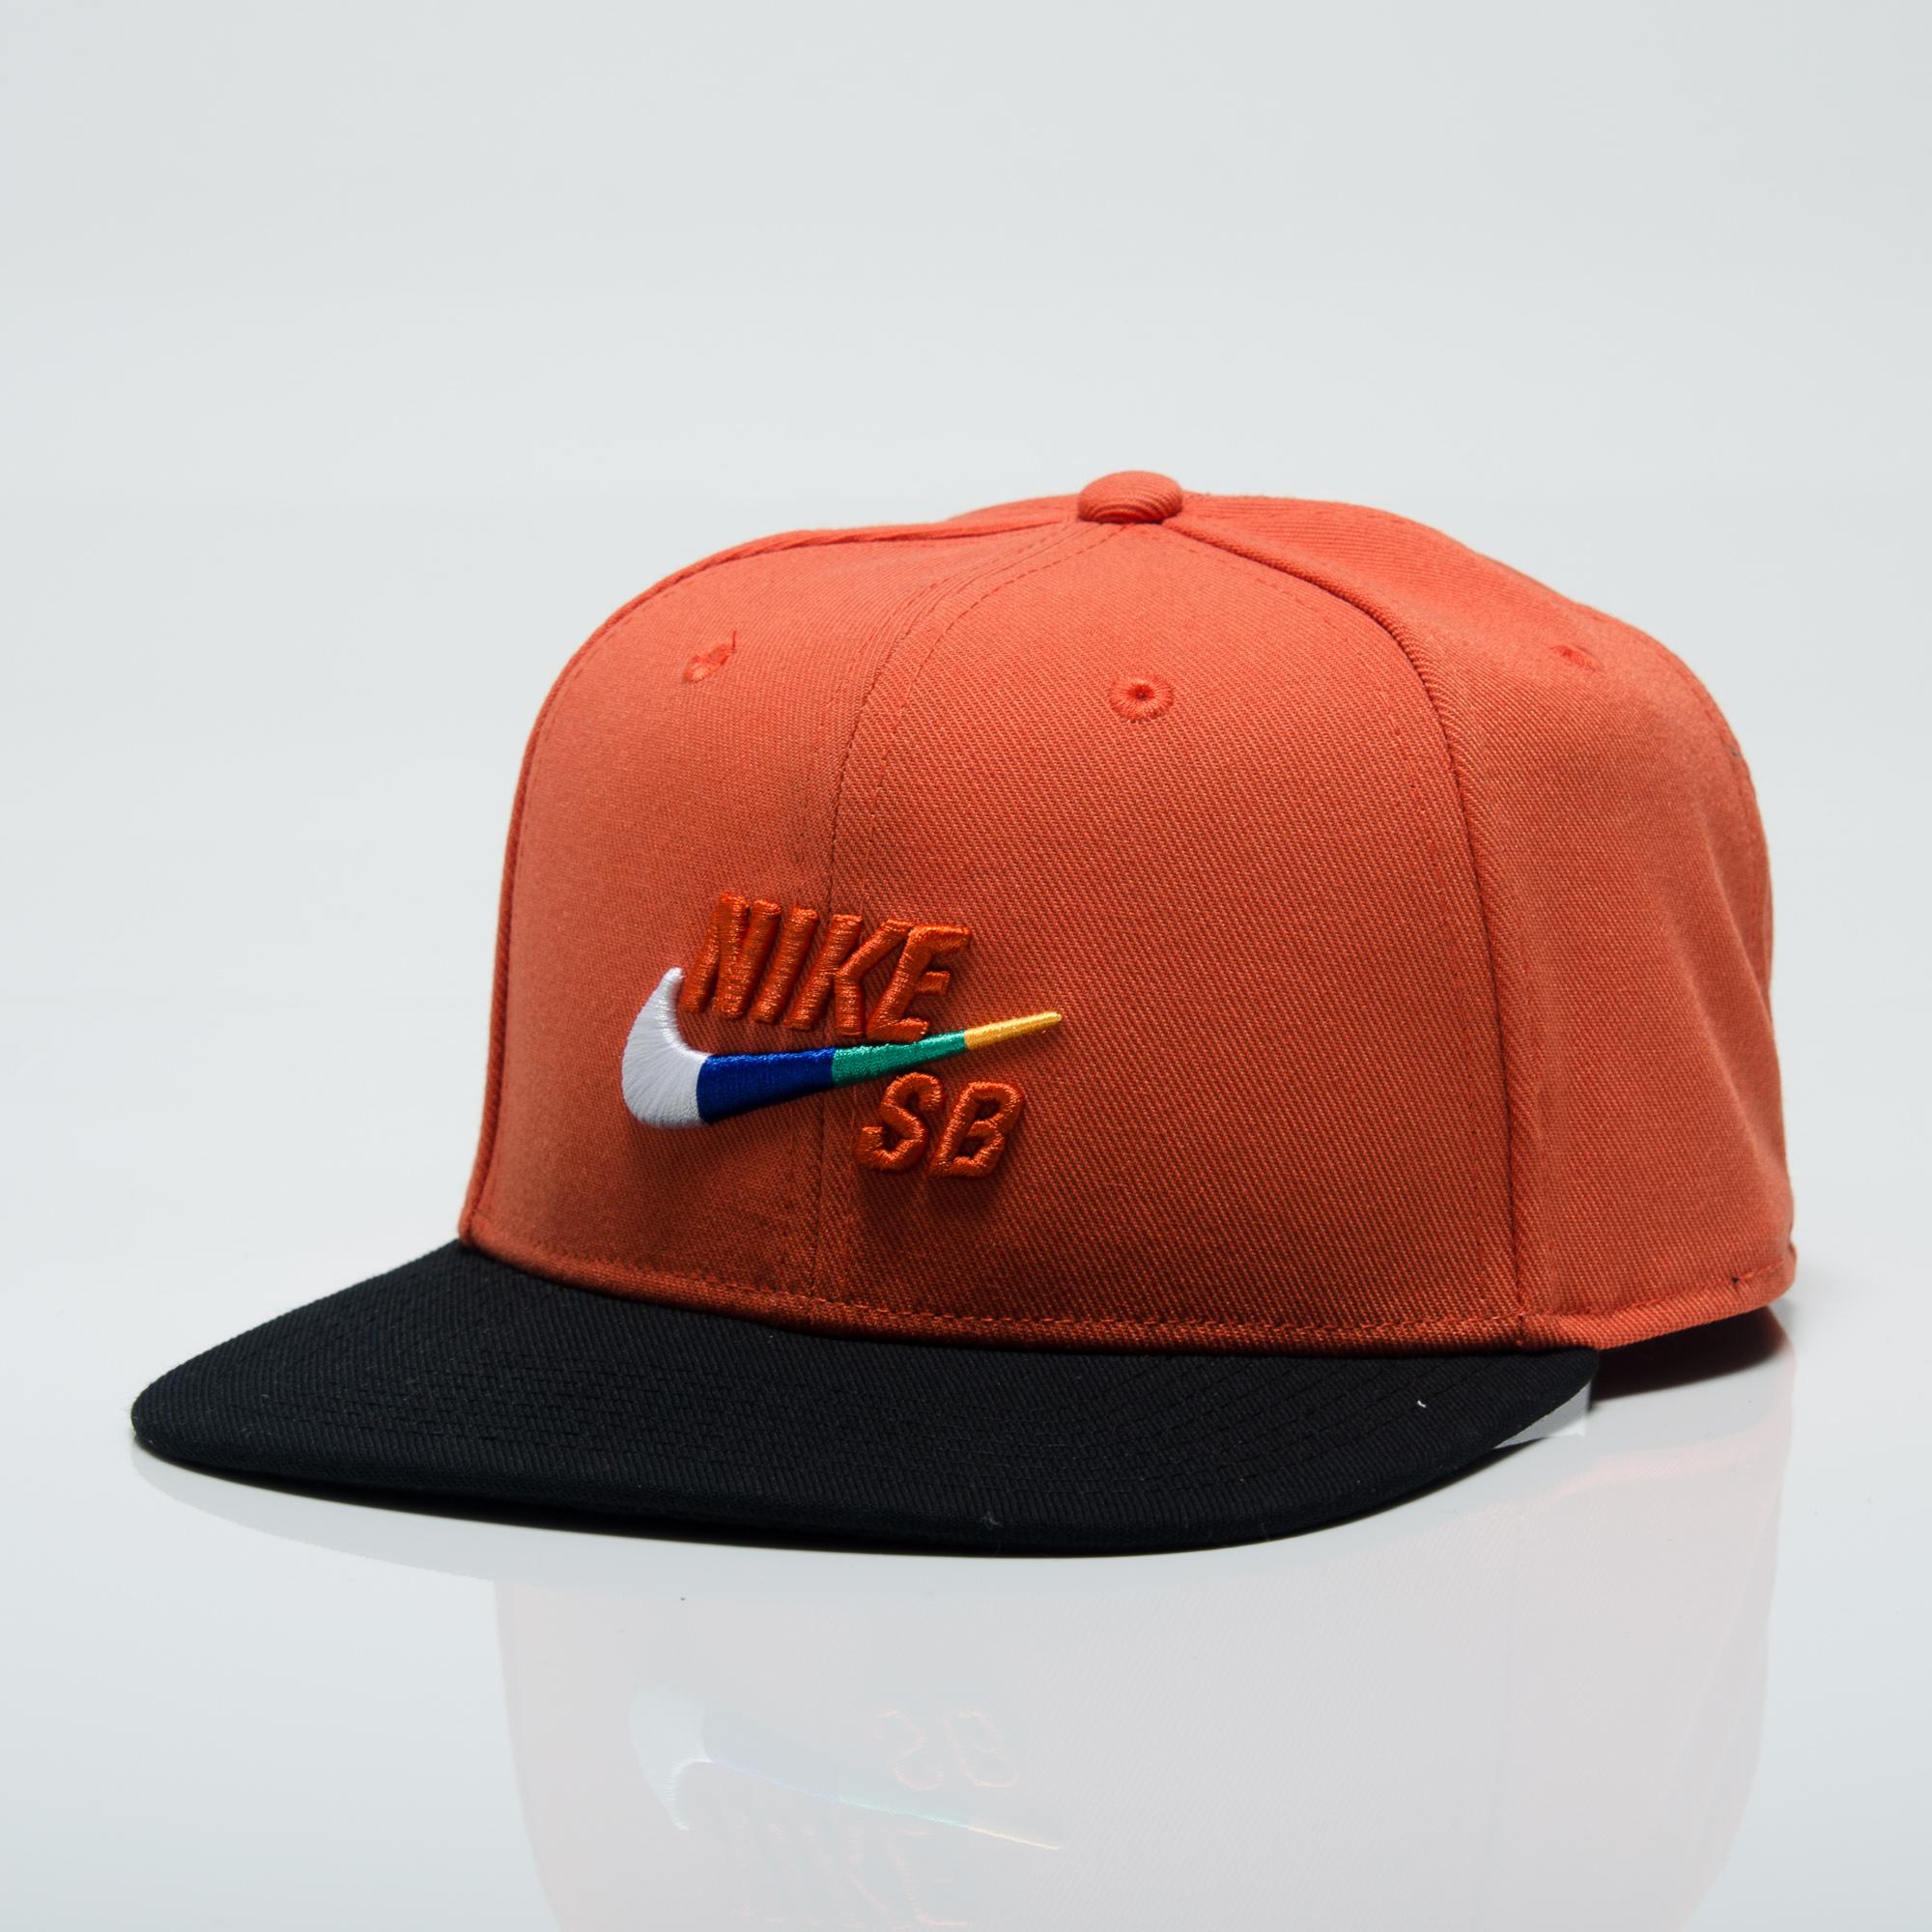 Nike SB Icon Snapback Cap - Caps Snapbacks - Sporting goods  01150a499e1